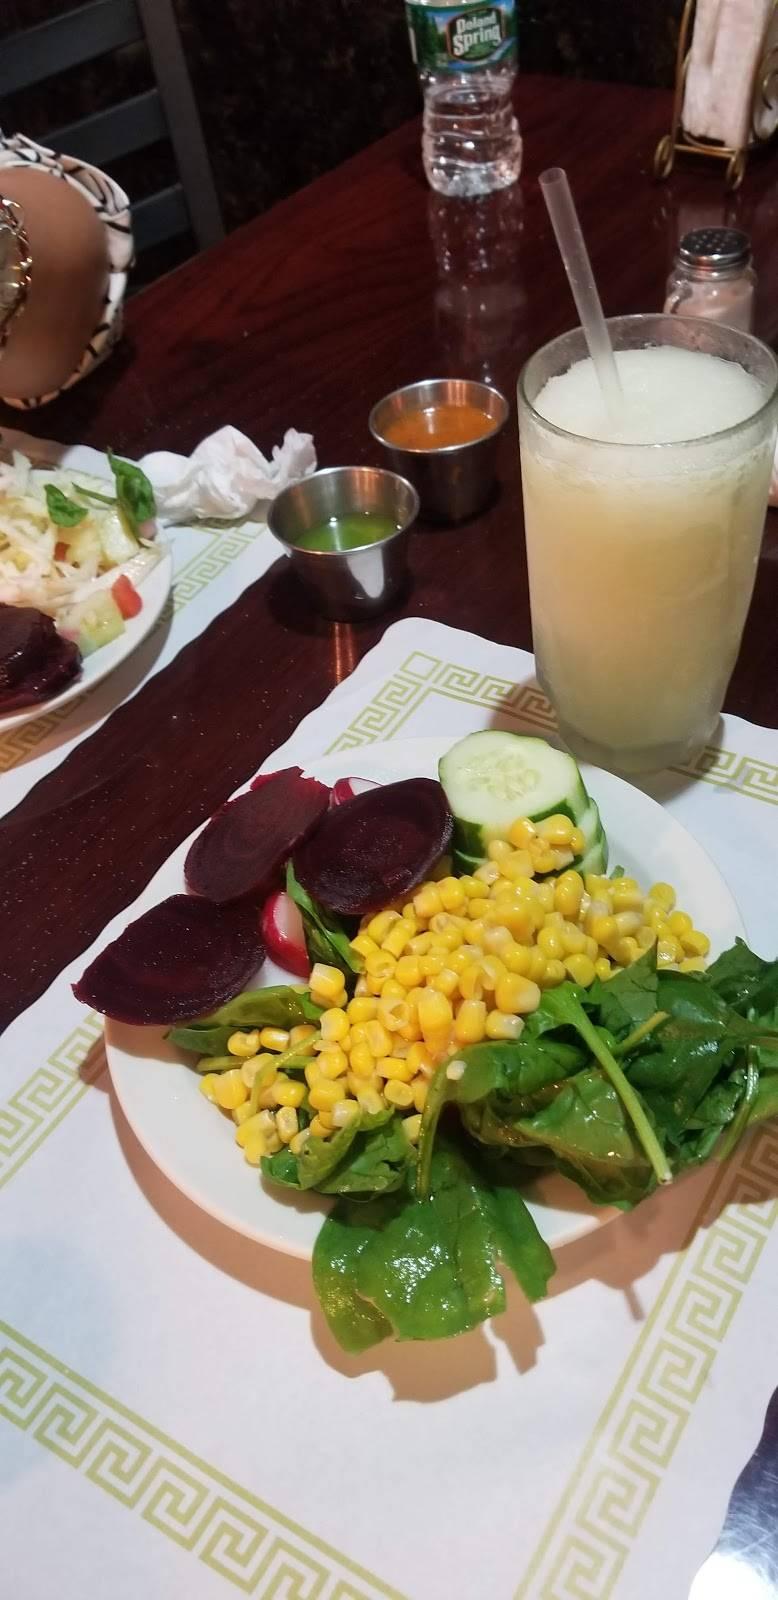 Brazilian Churrascaria   restaurant   6910 Bergenline Ave, Guttenberg, NJ 07093, USA   2018544144 OR +1 201-854-4144